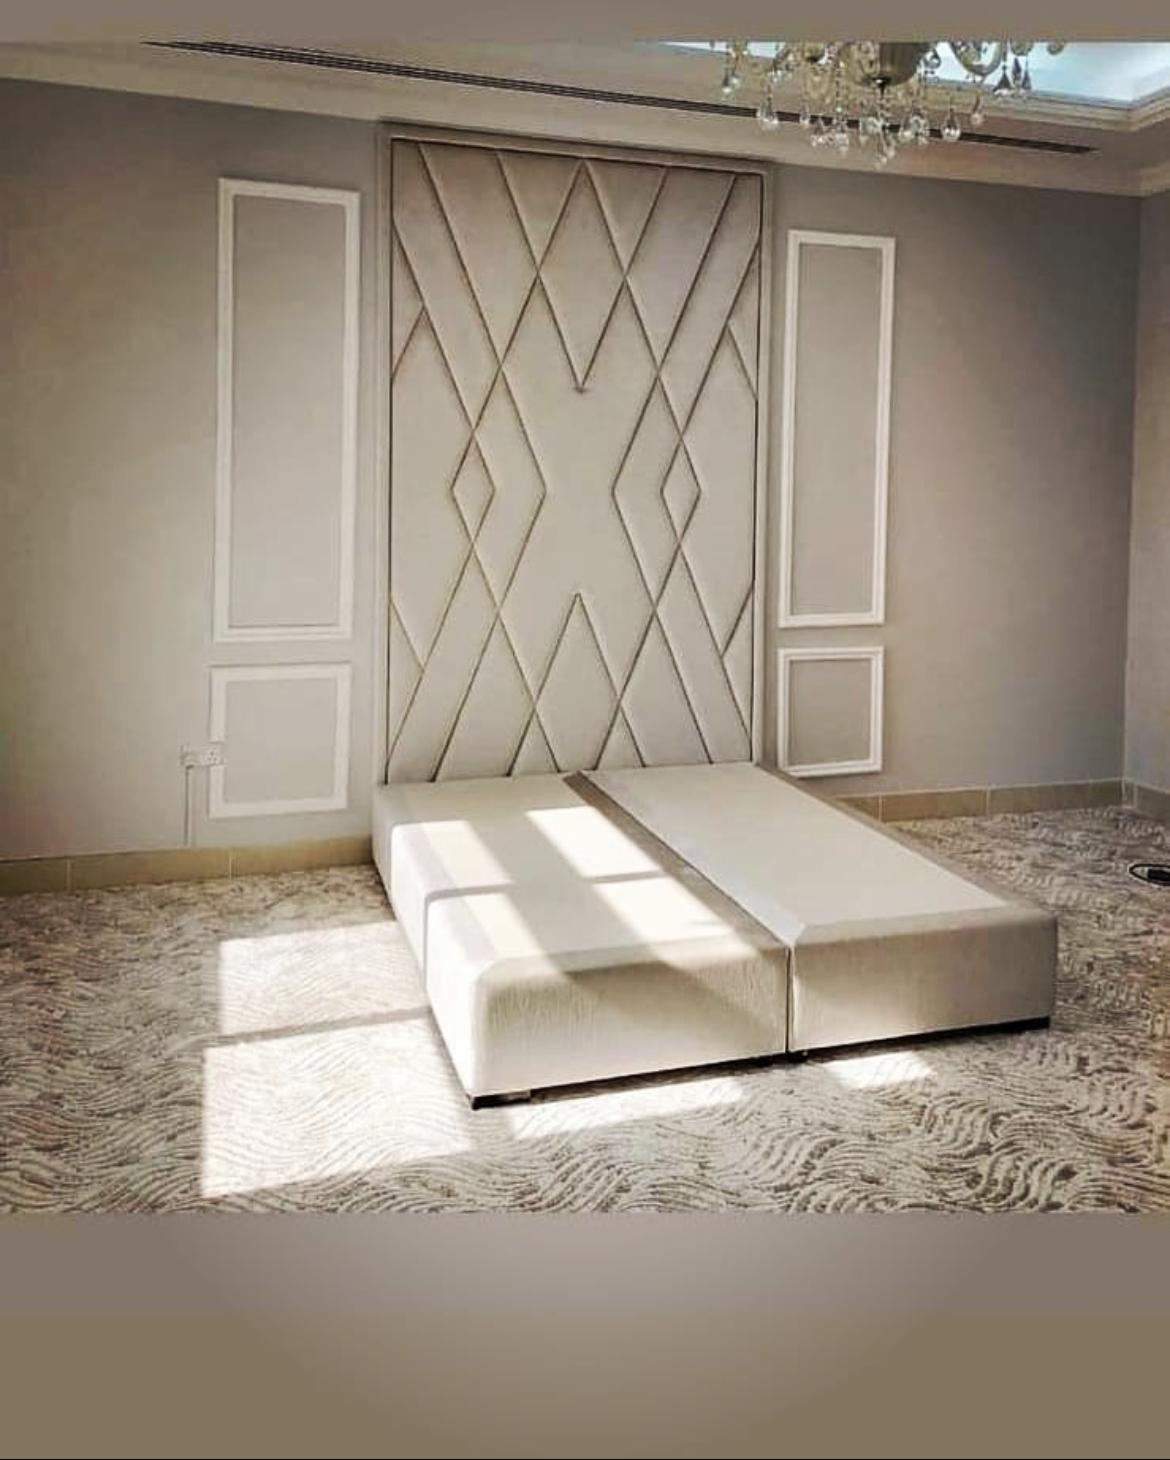 Carpet, curtain, glass, hadid, wallpaper, paint, m